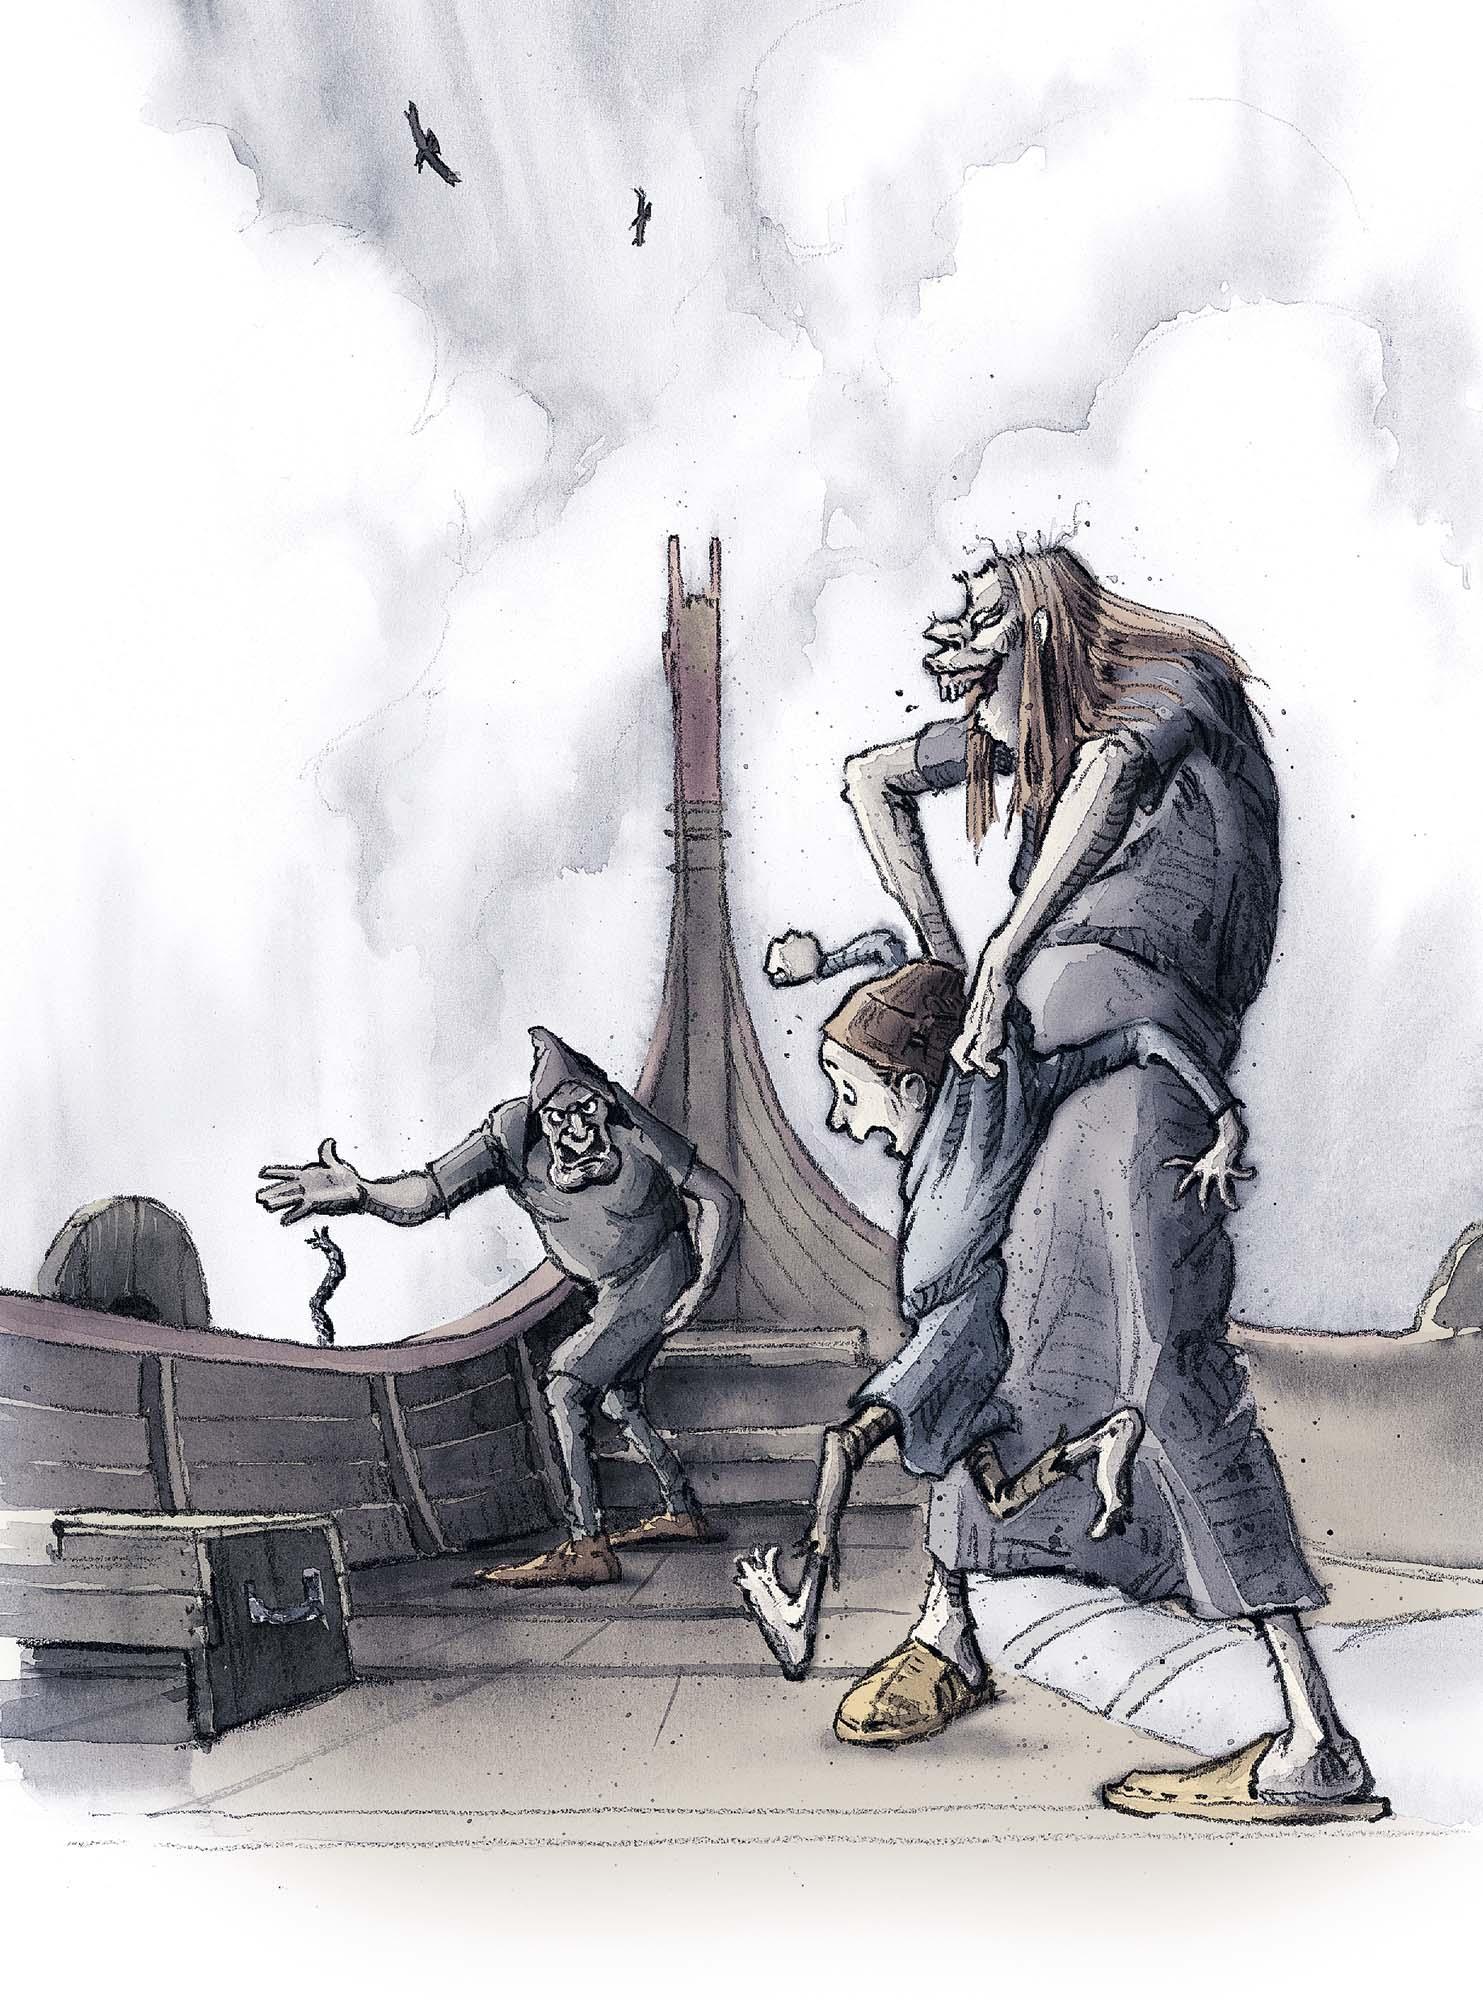 The Stranger's Grave: Dropping off Halvdan's dog (Client: Bonnier Carlsen Publishing House, Sweden).